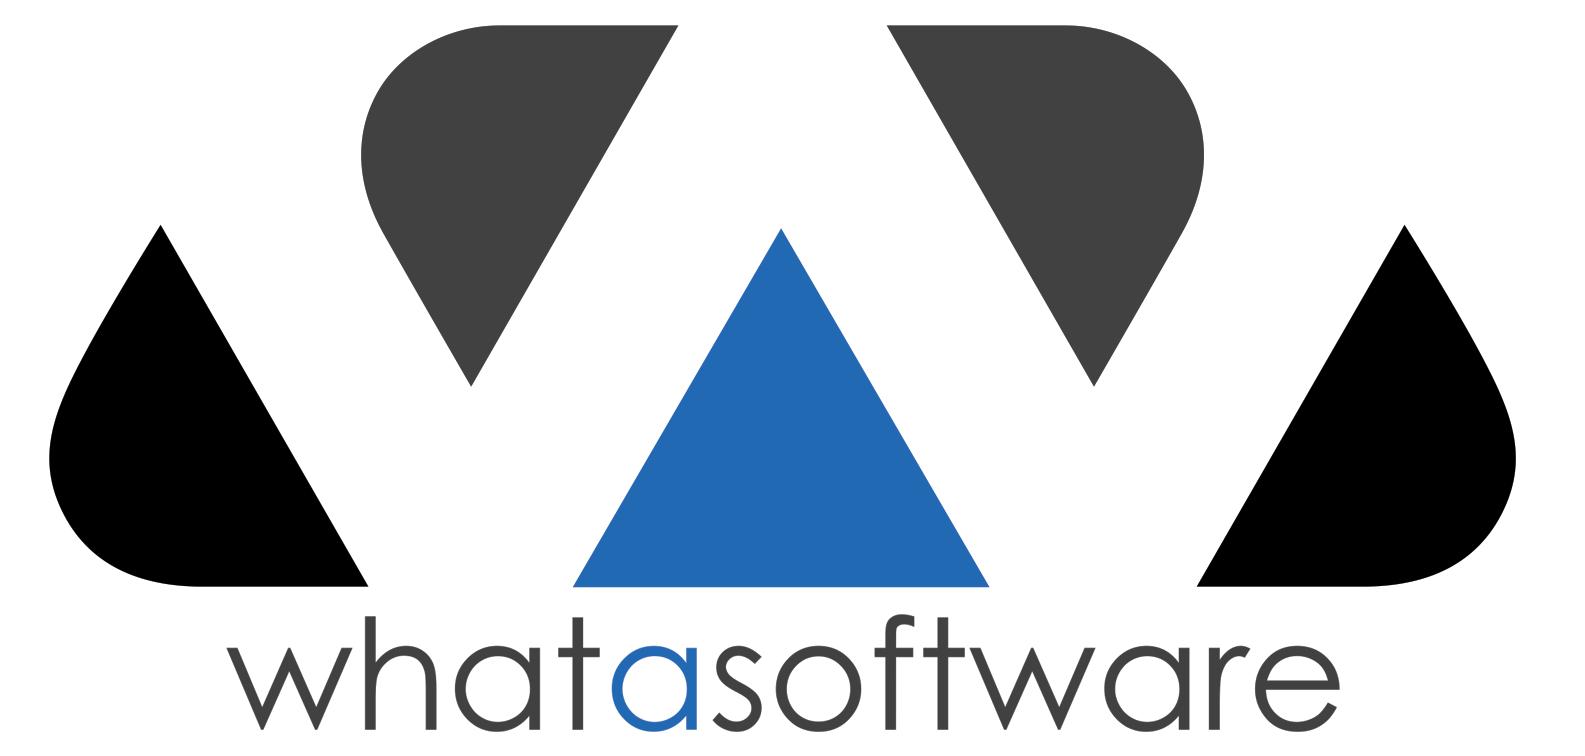 User Vendor Login Digital Advertising Business Software Adwords